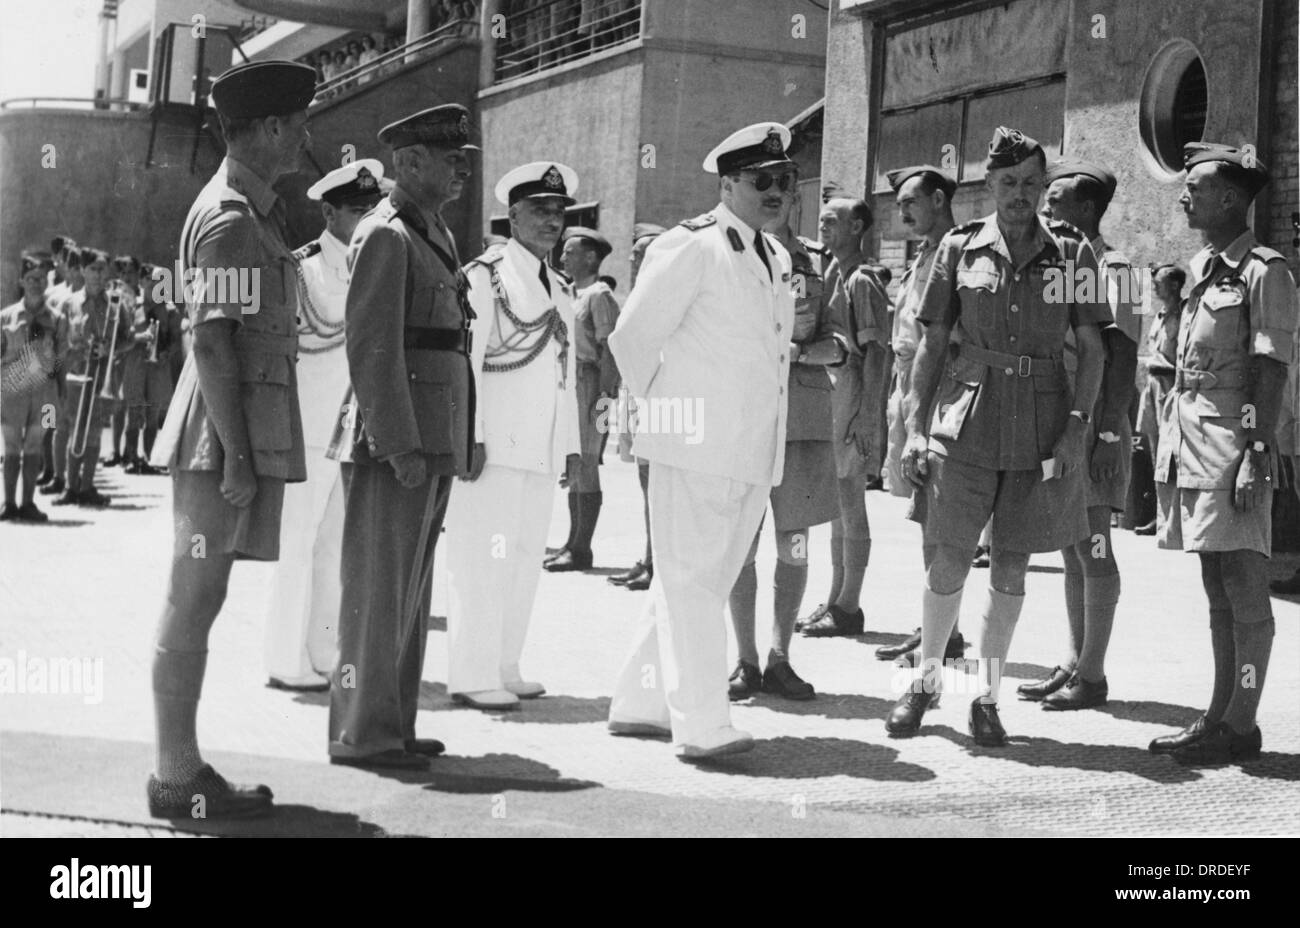 King Farouk with Air Vice Marshall Toomer - Stock Image